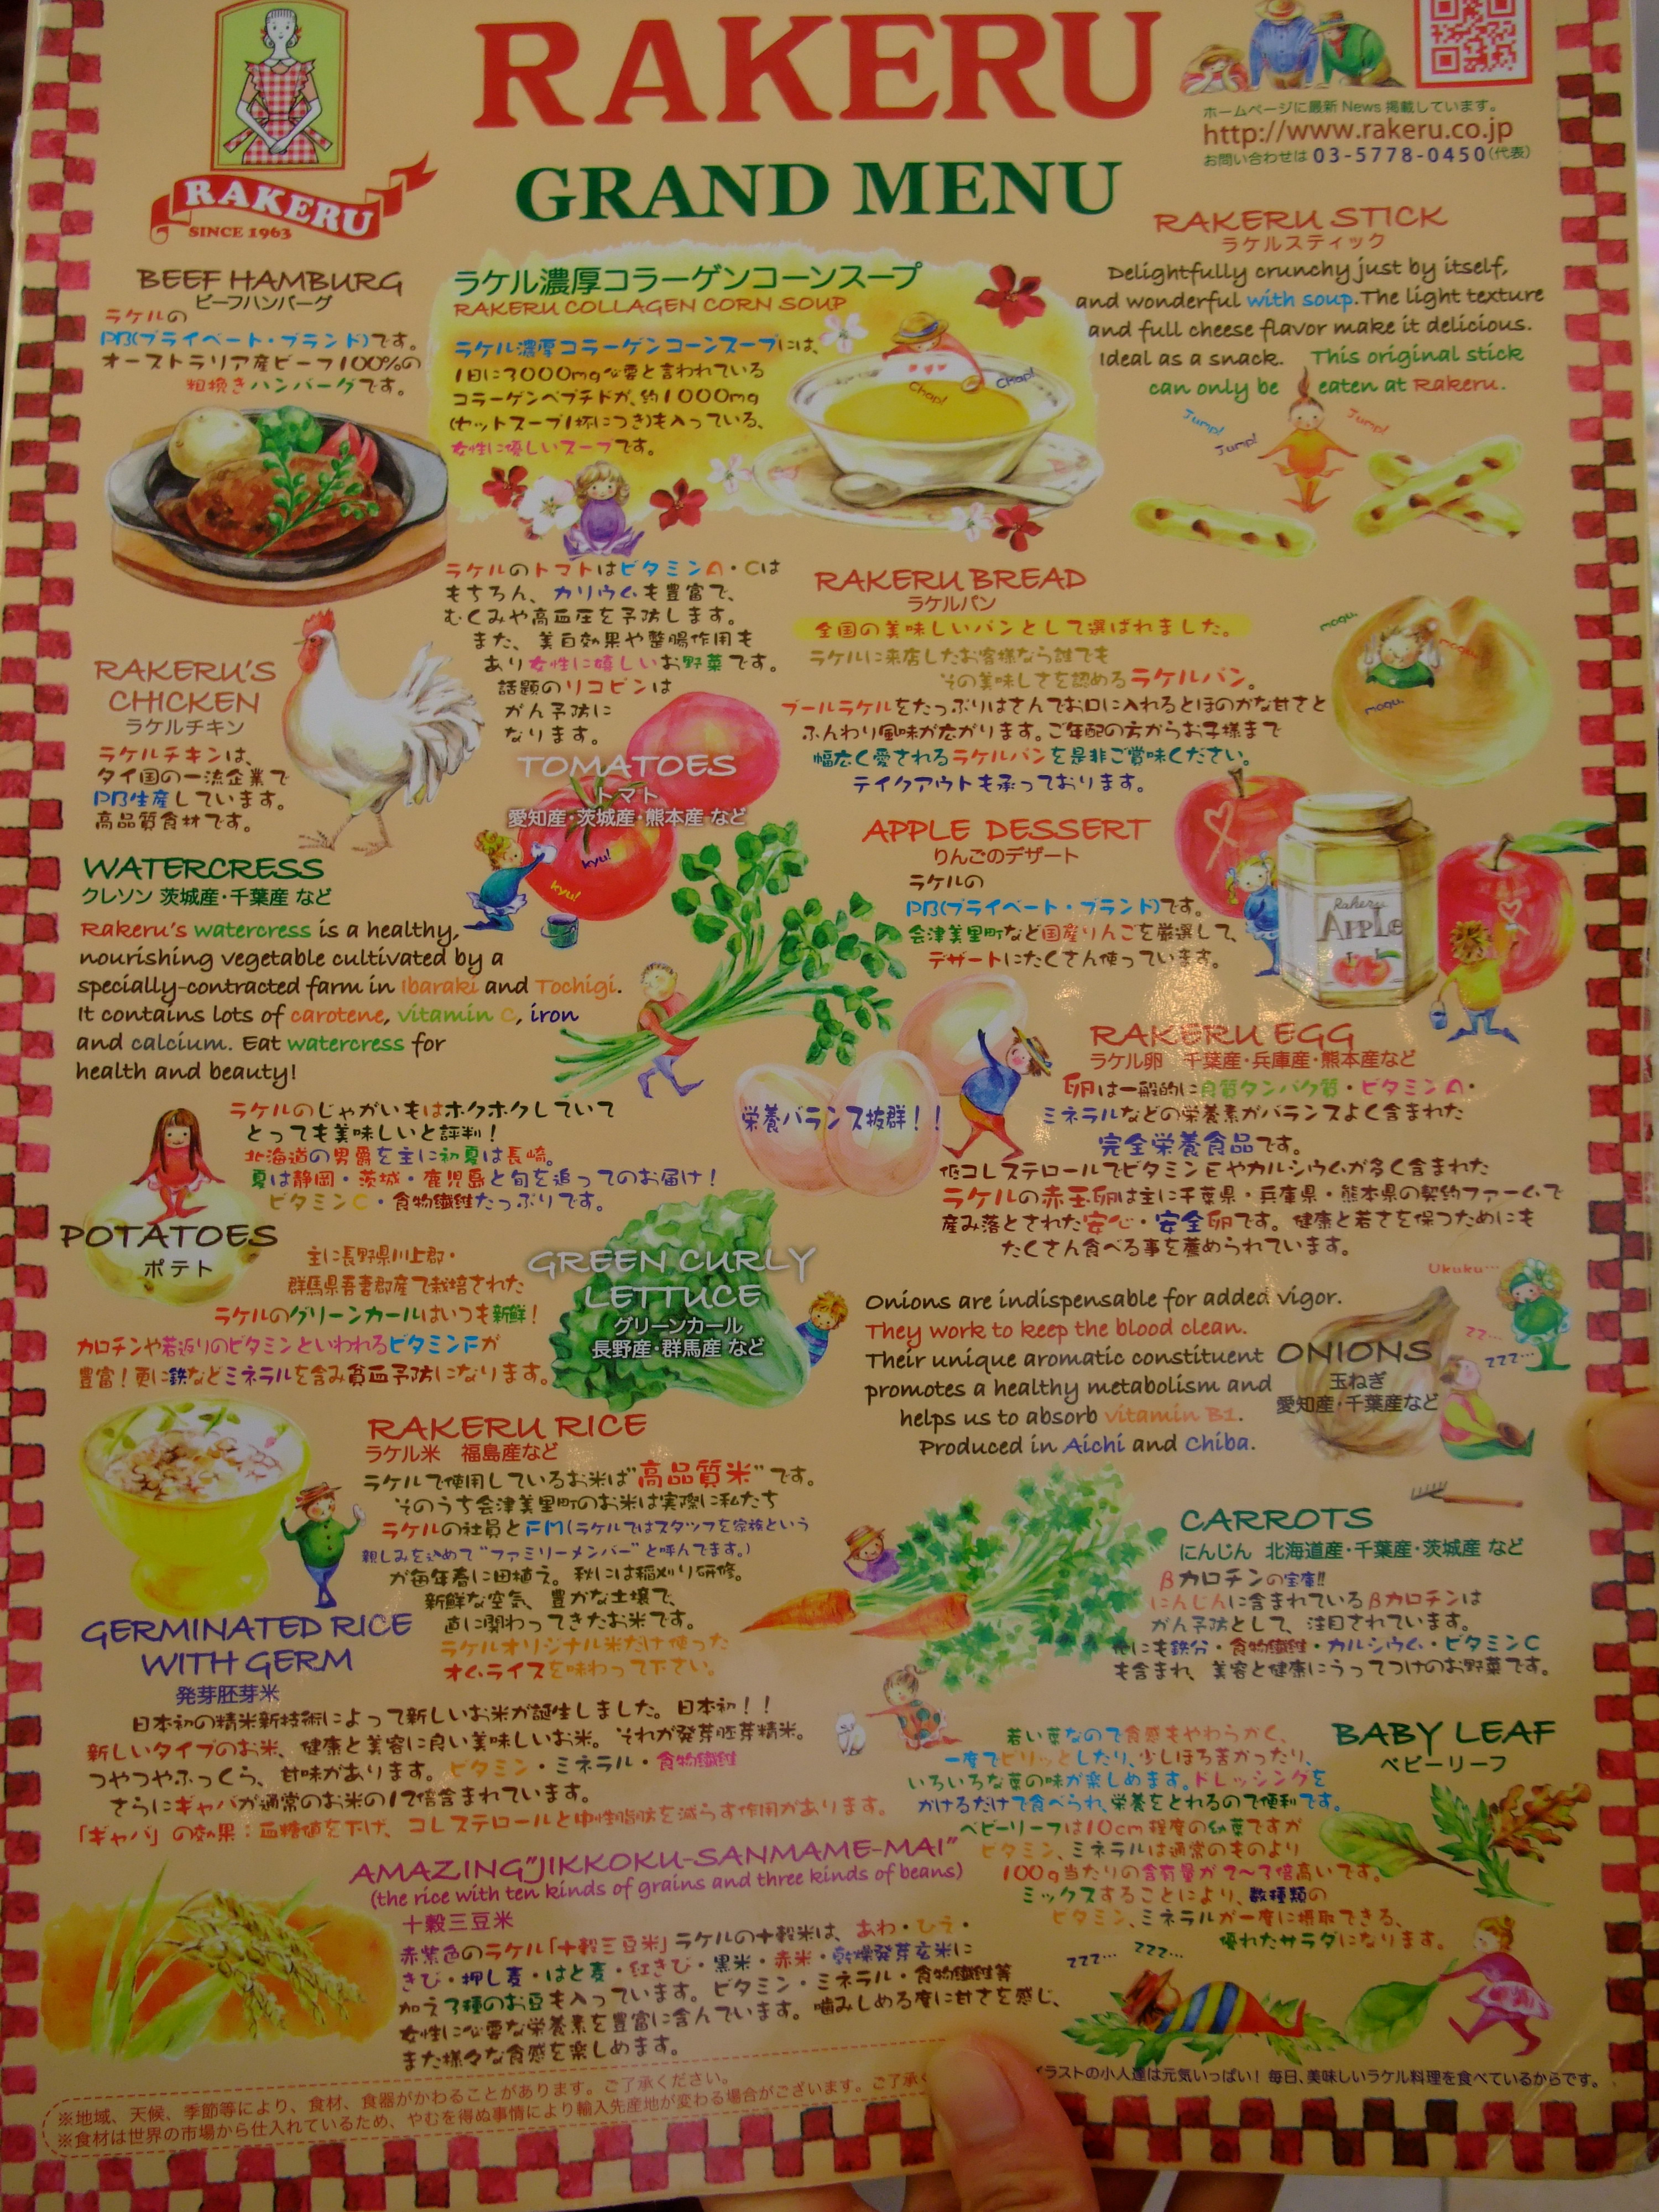 RAKERU in ららぽーと横浜